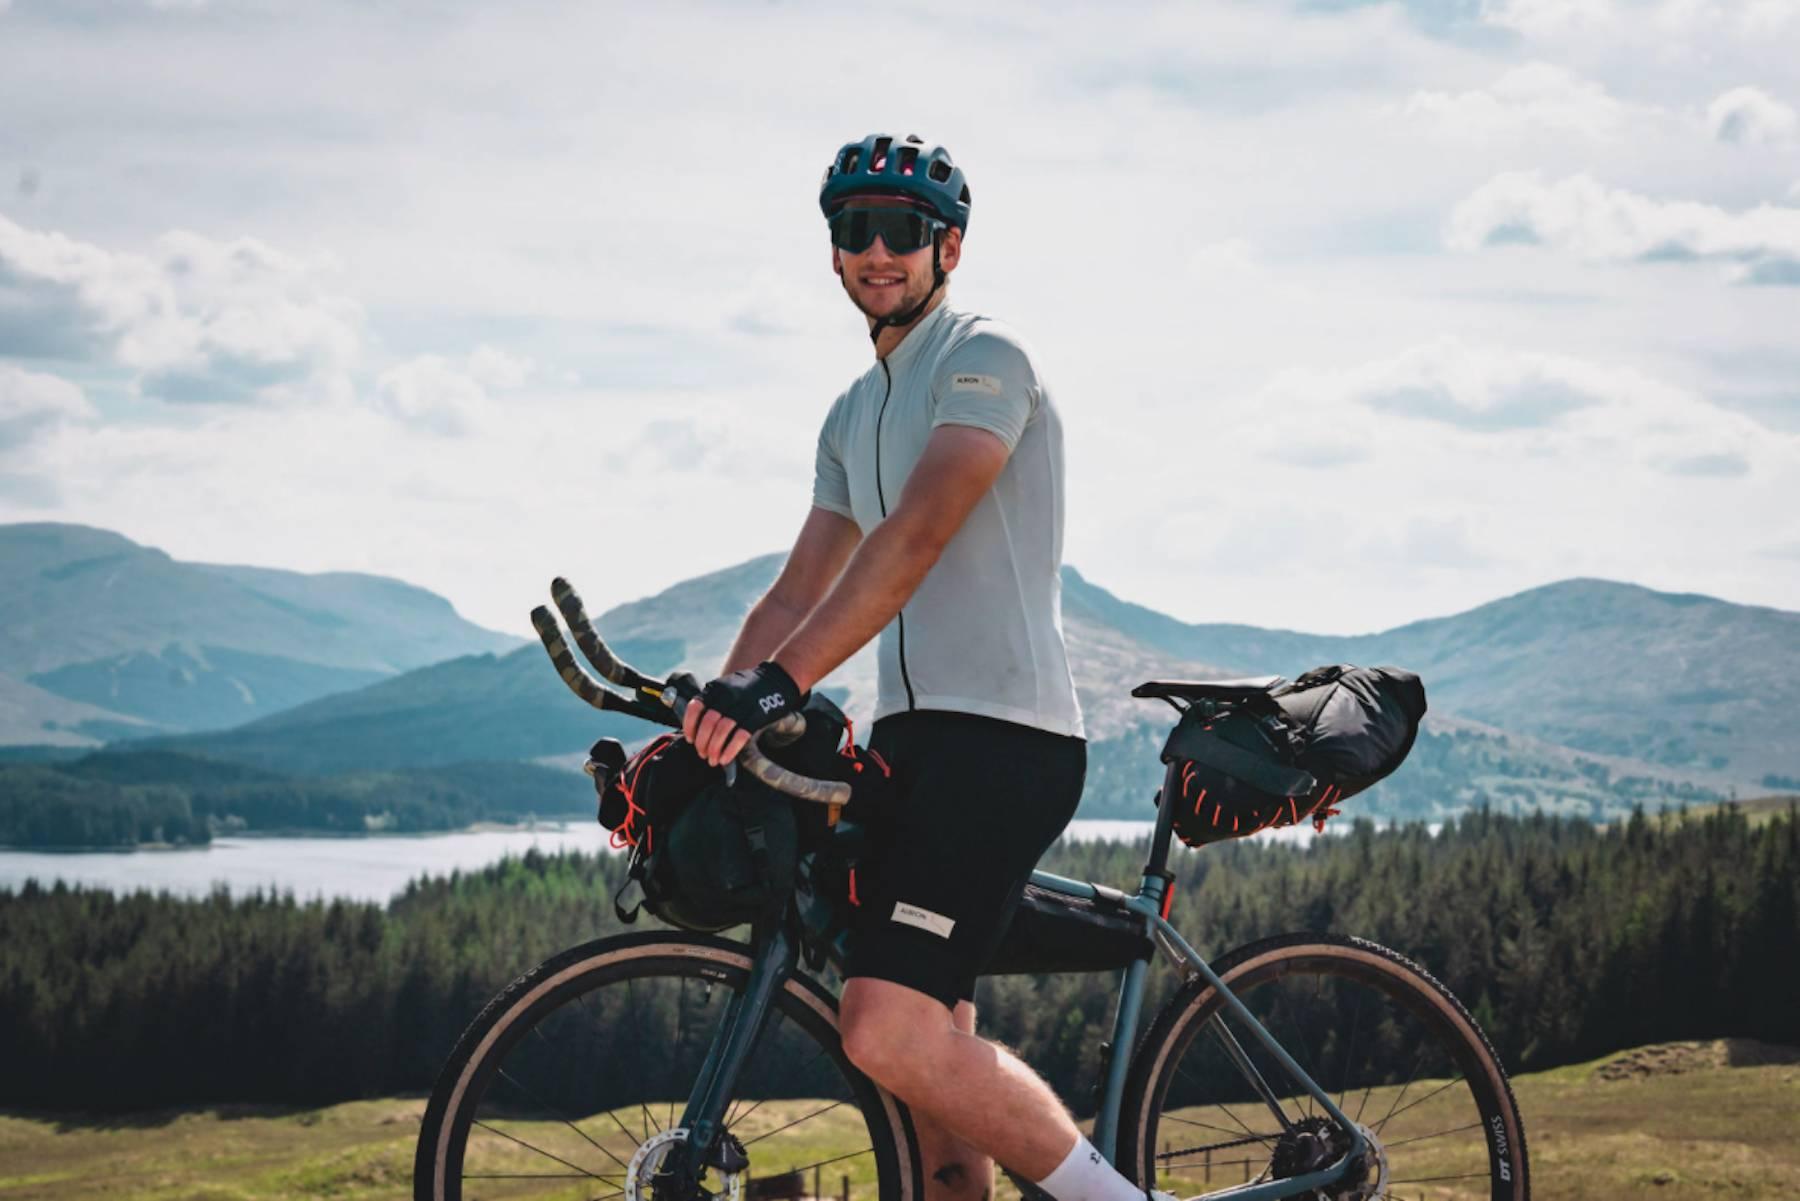 aaron rolph on his bike